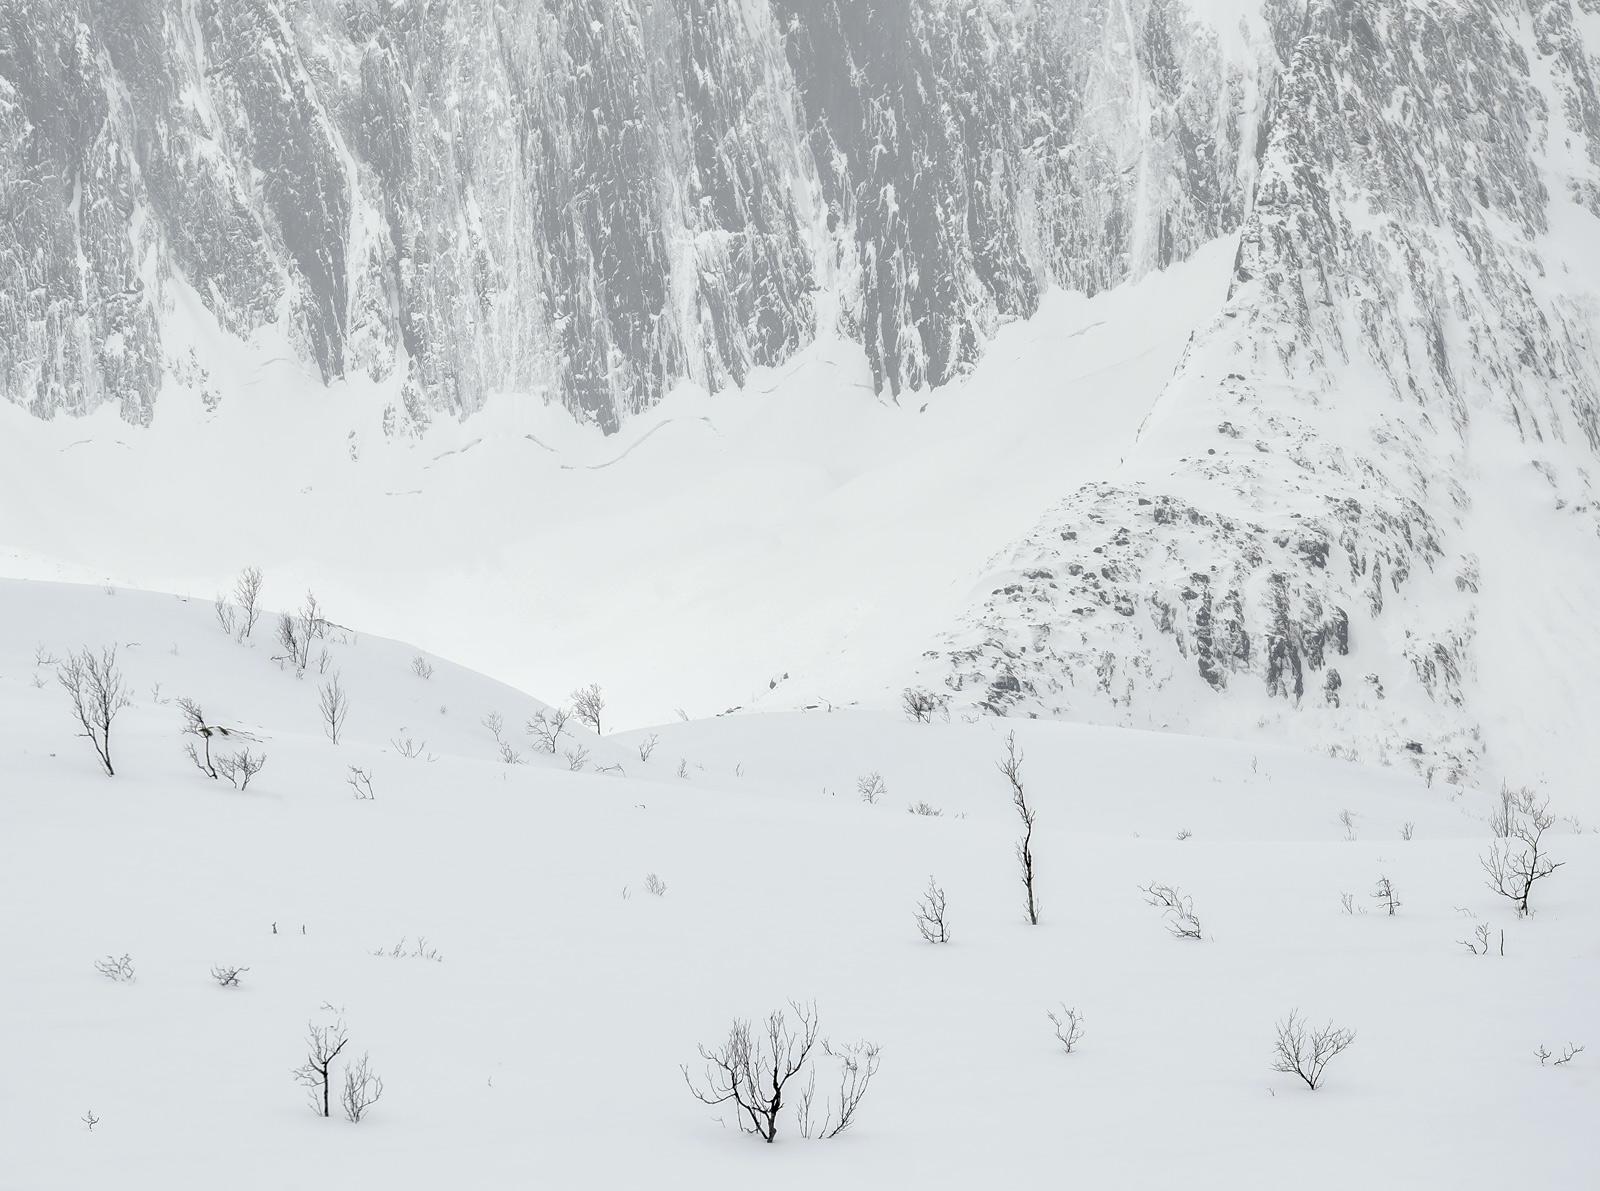 Engraving Senja, Melfjordbotn, Senja, Norway, impressive, charcoal, etched, slopes, ice, encrusted, rock, drifted, snow , photo